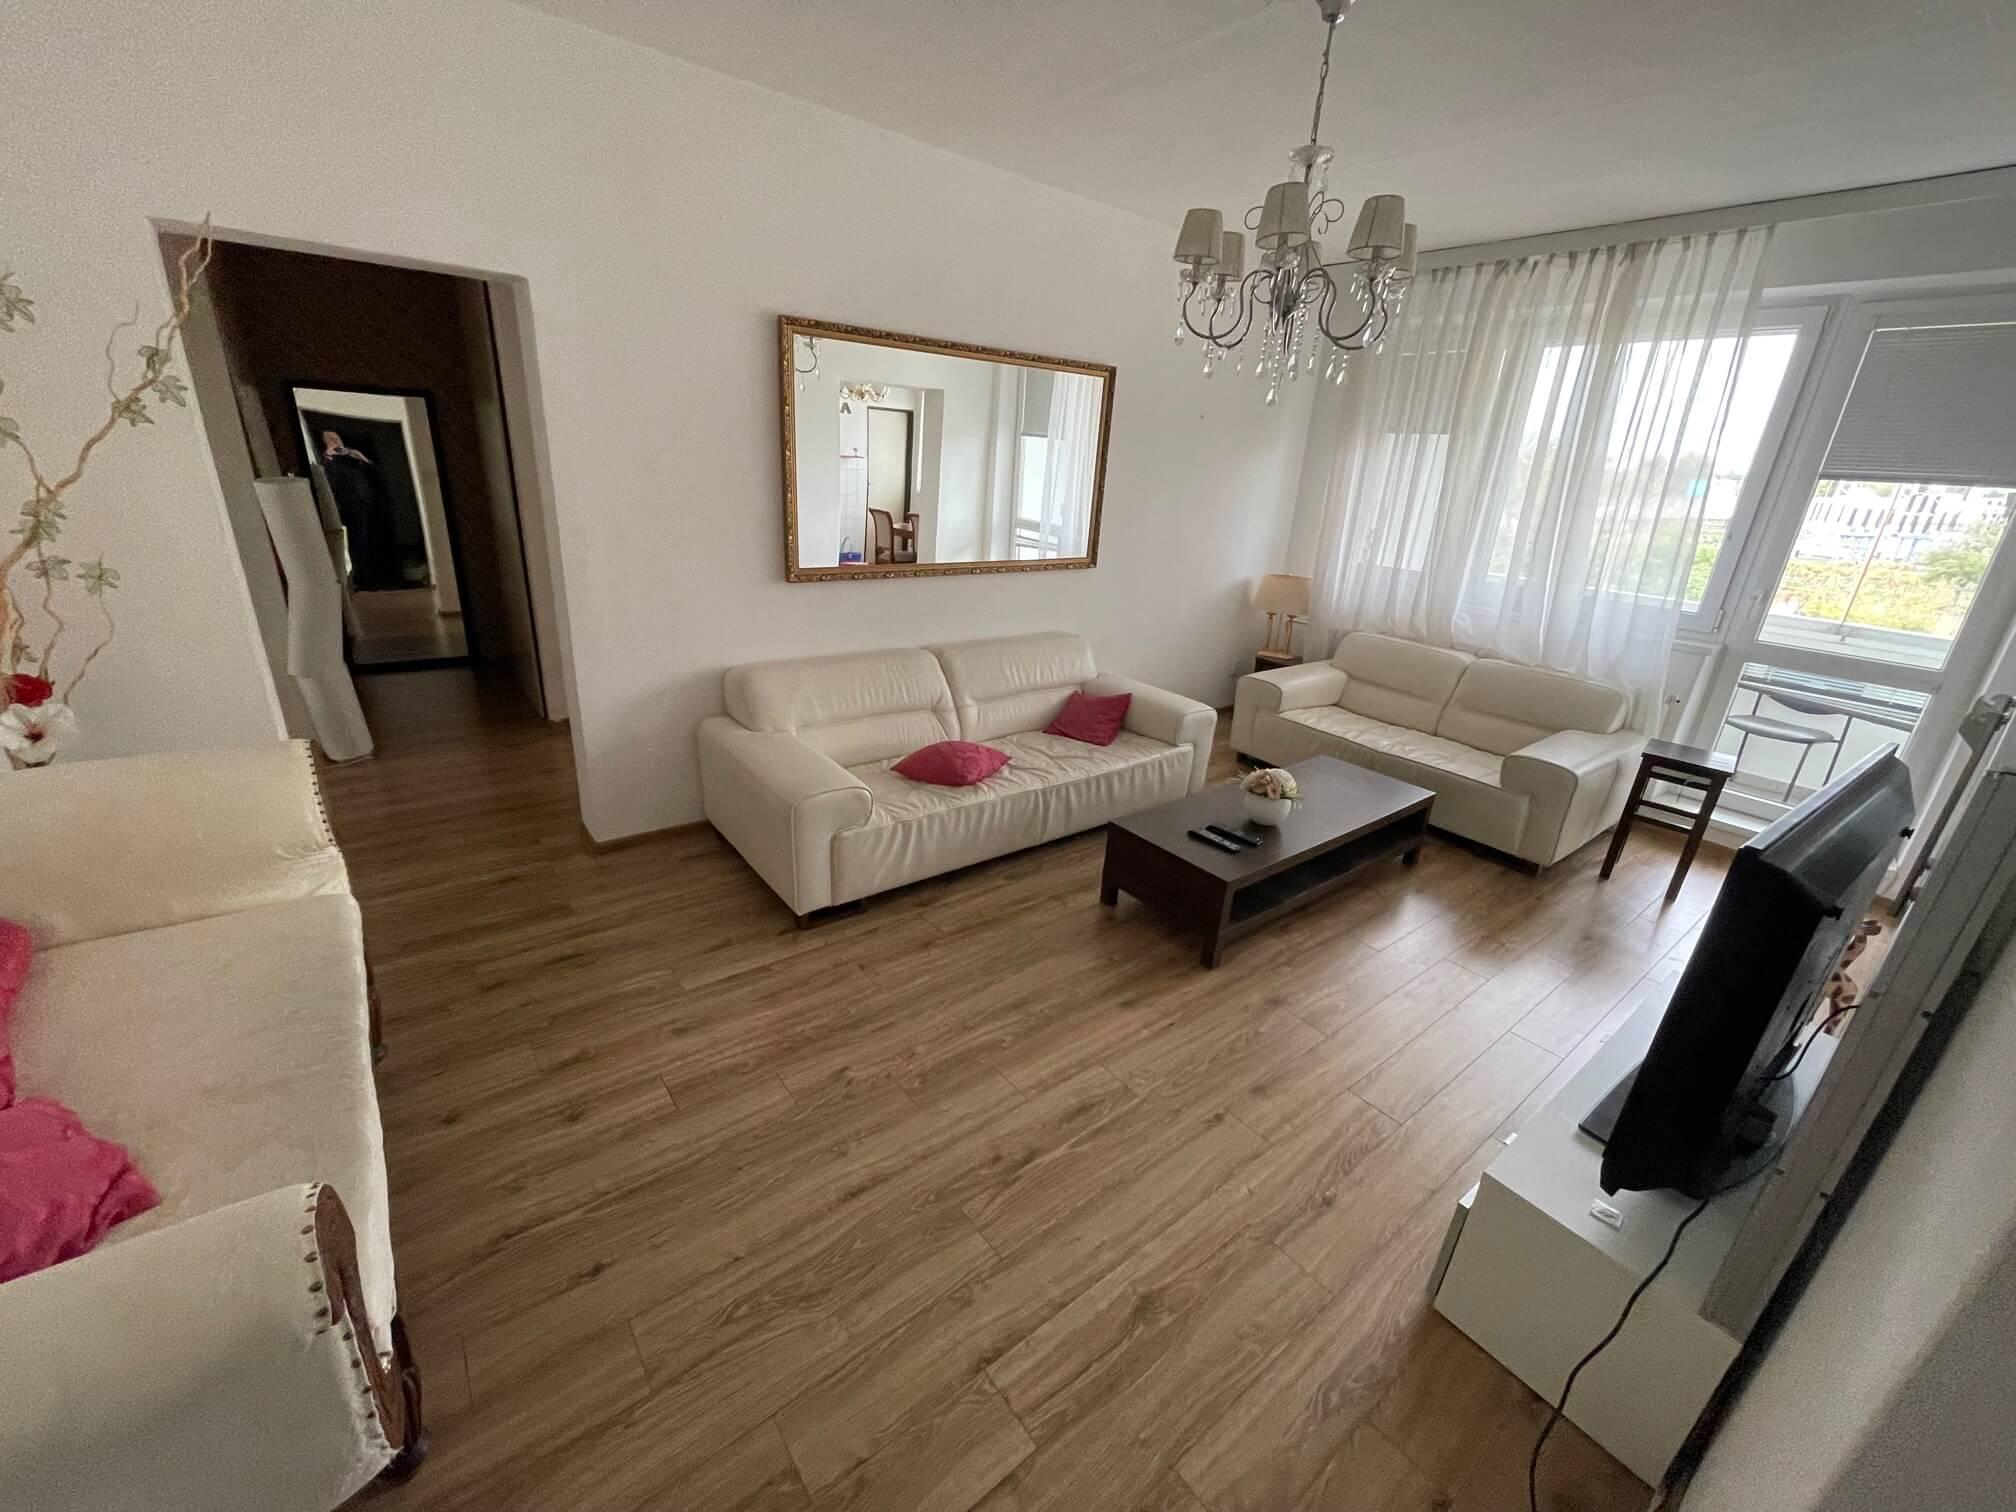 Exkluzívne na prenájom 3 izbový byt, 83m2, 2x loggia 4,5m2, Karolovka, Janotová 8-25